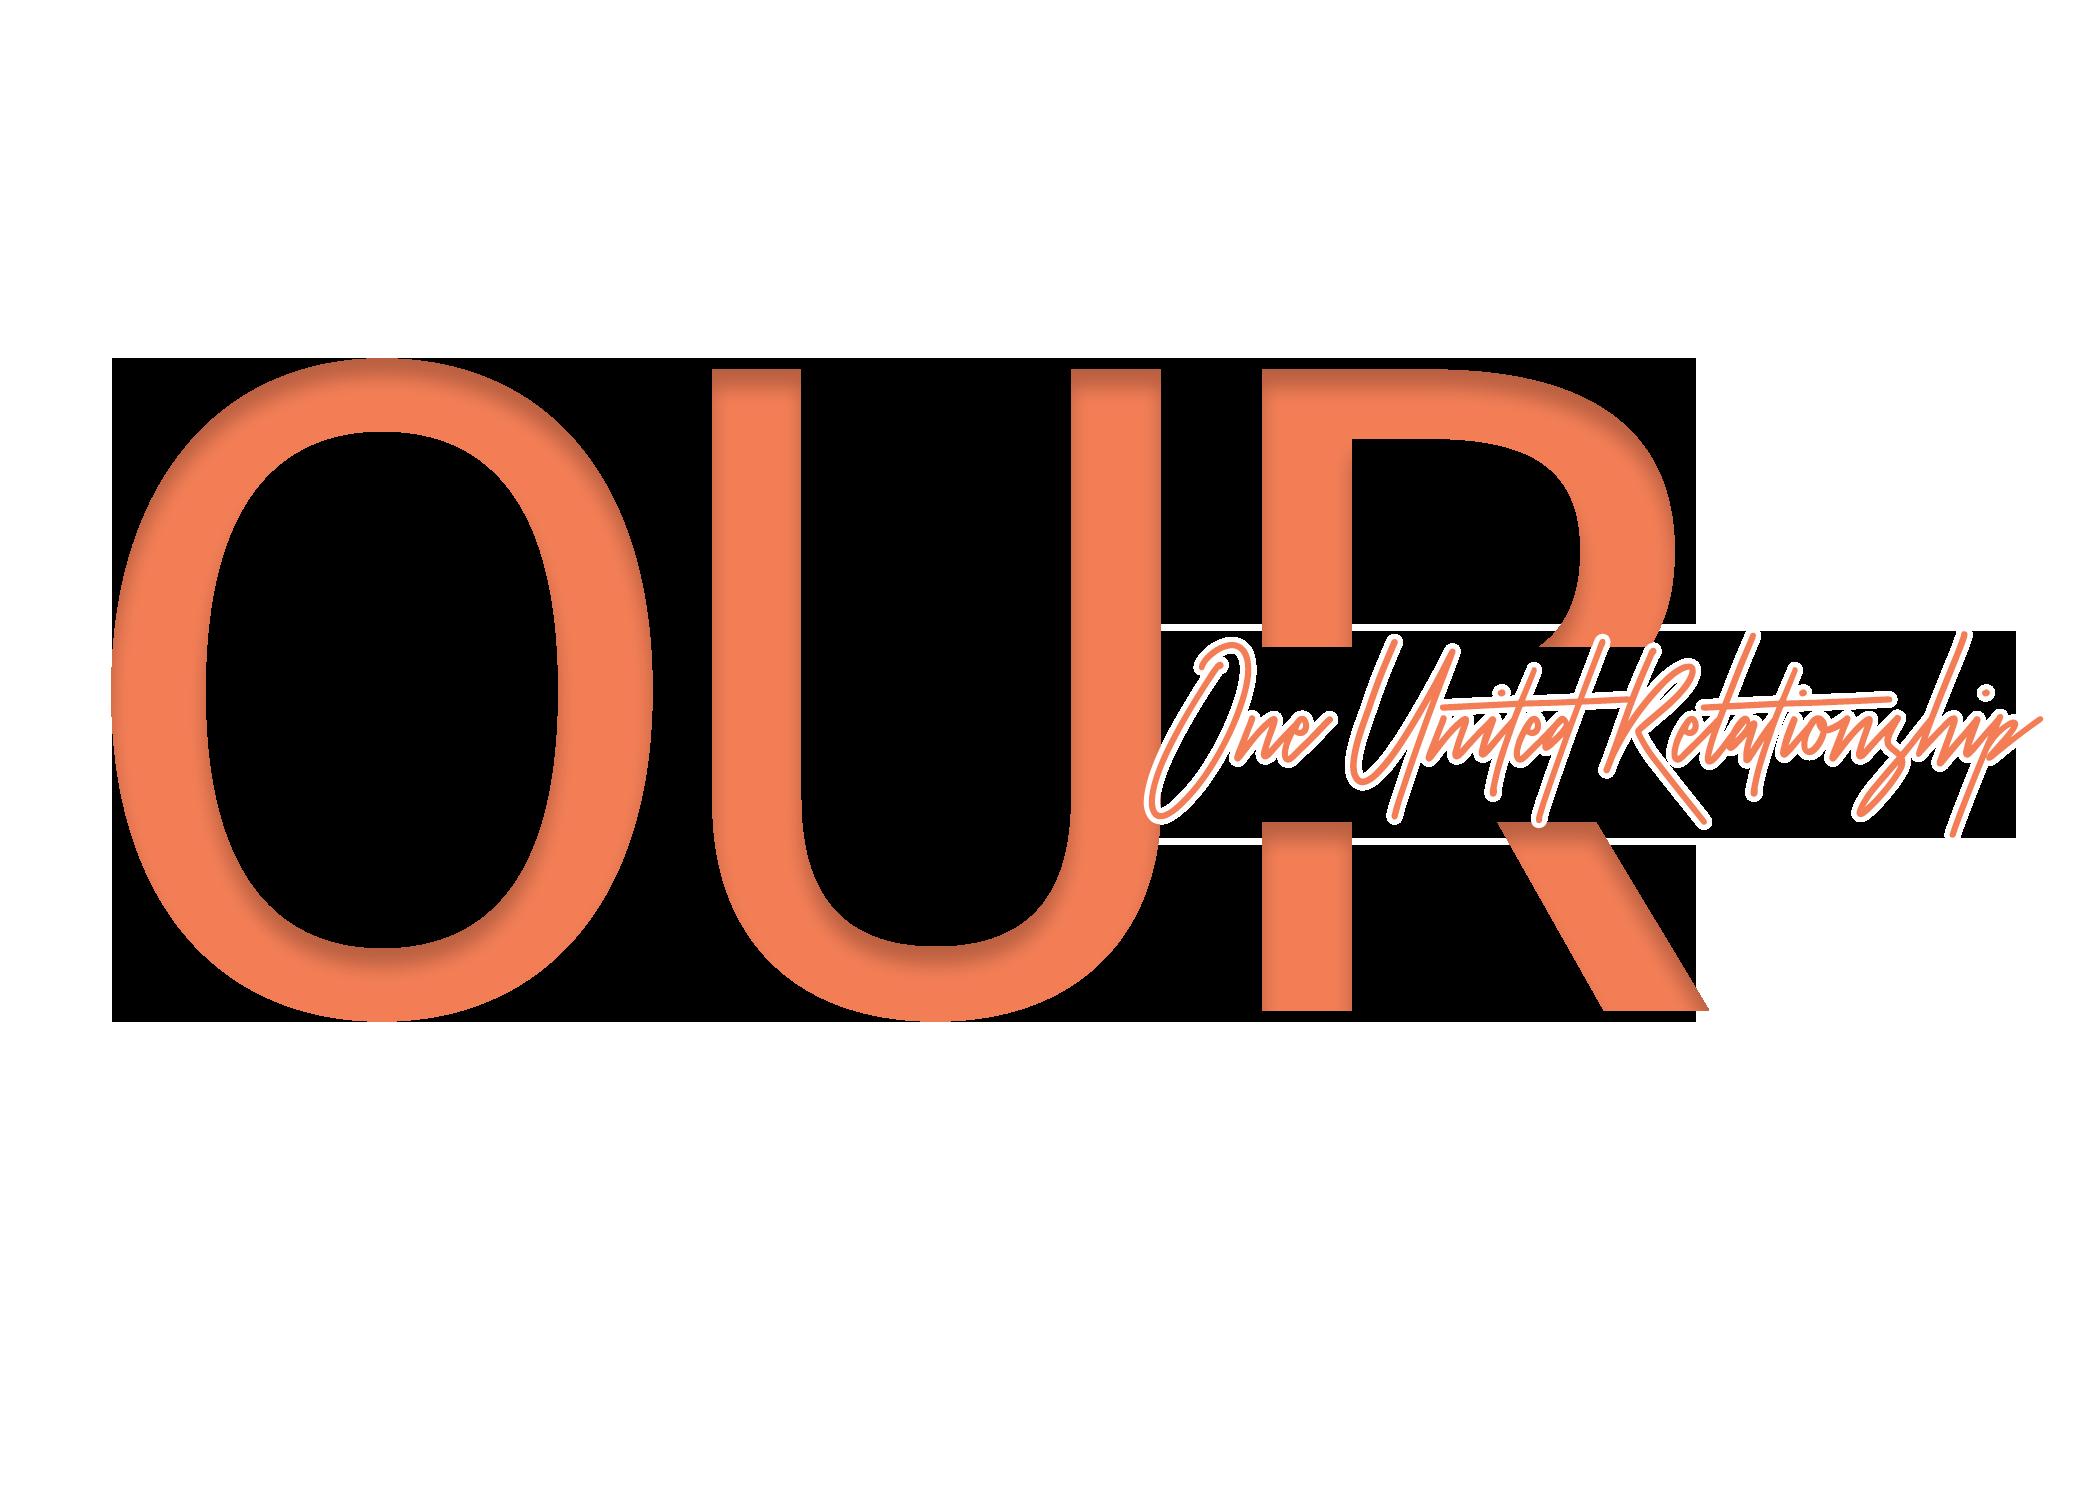 One United Relationship logo